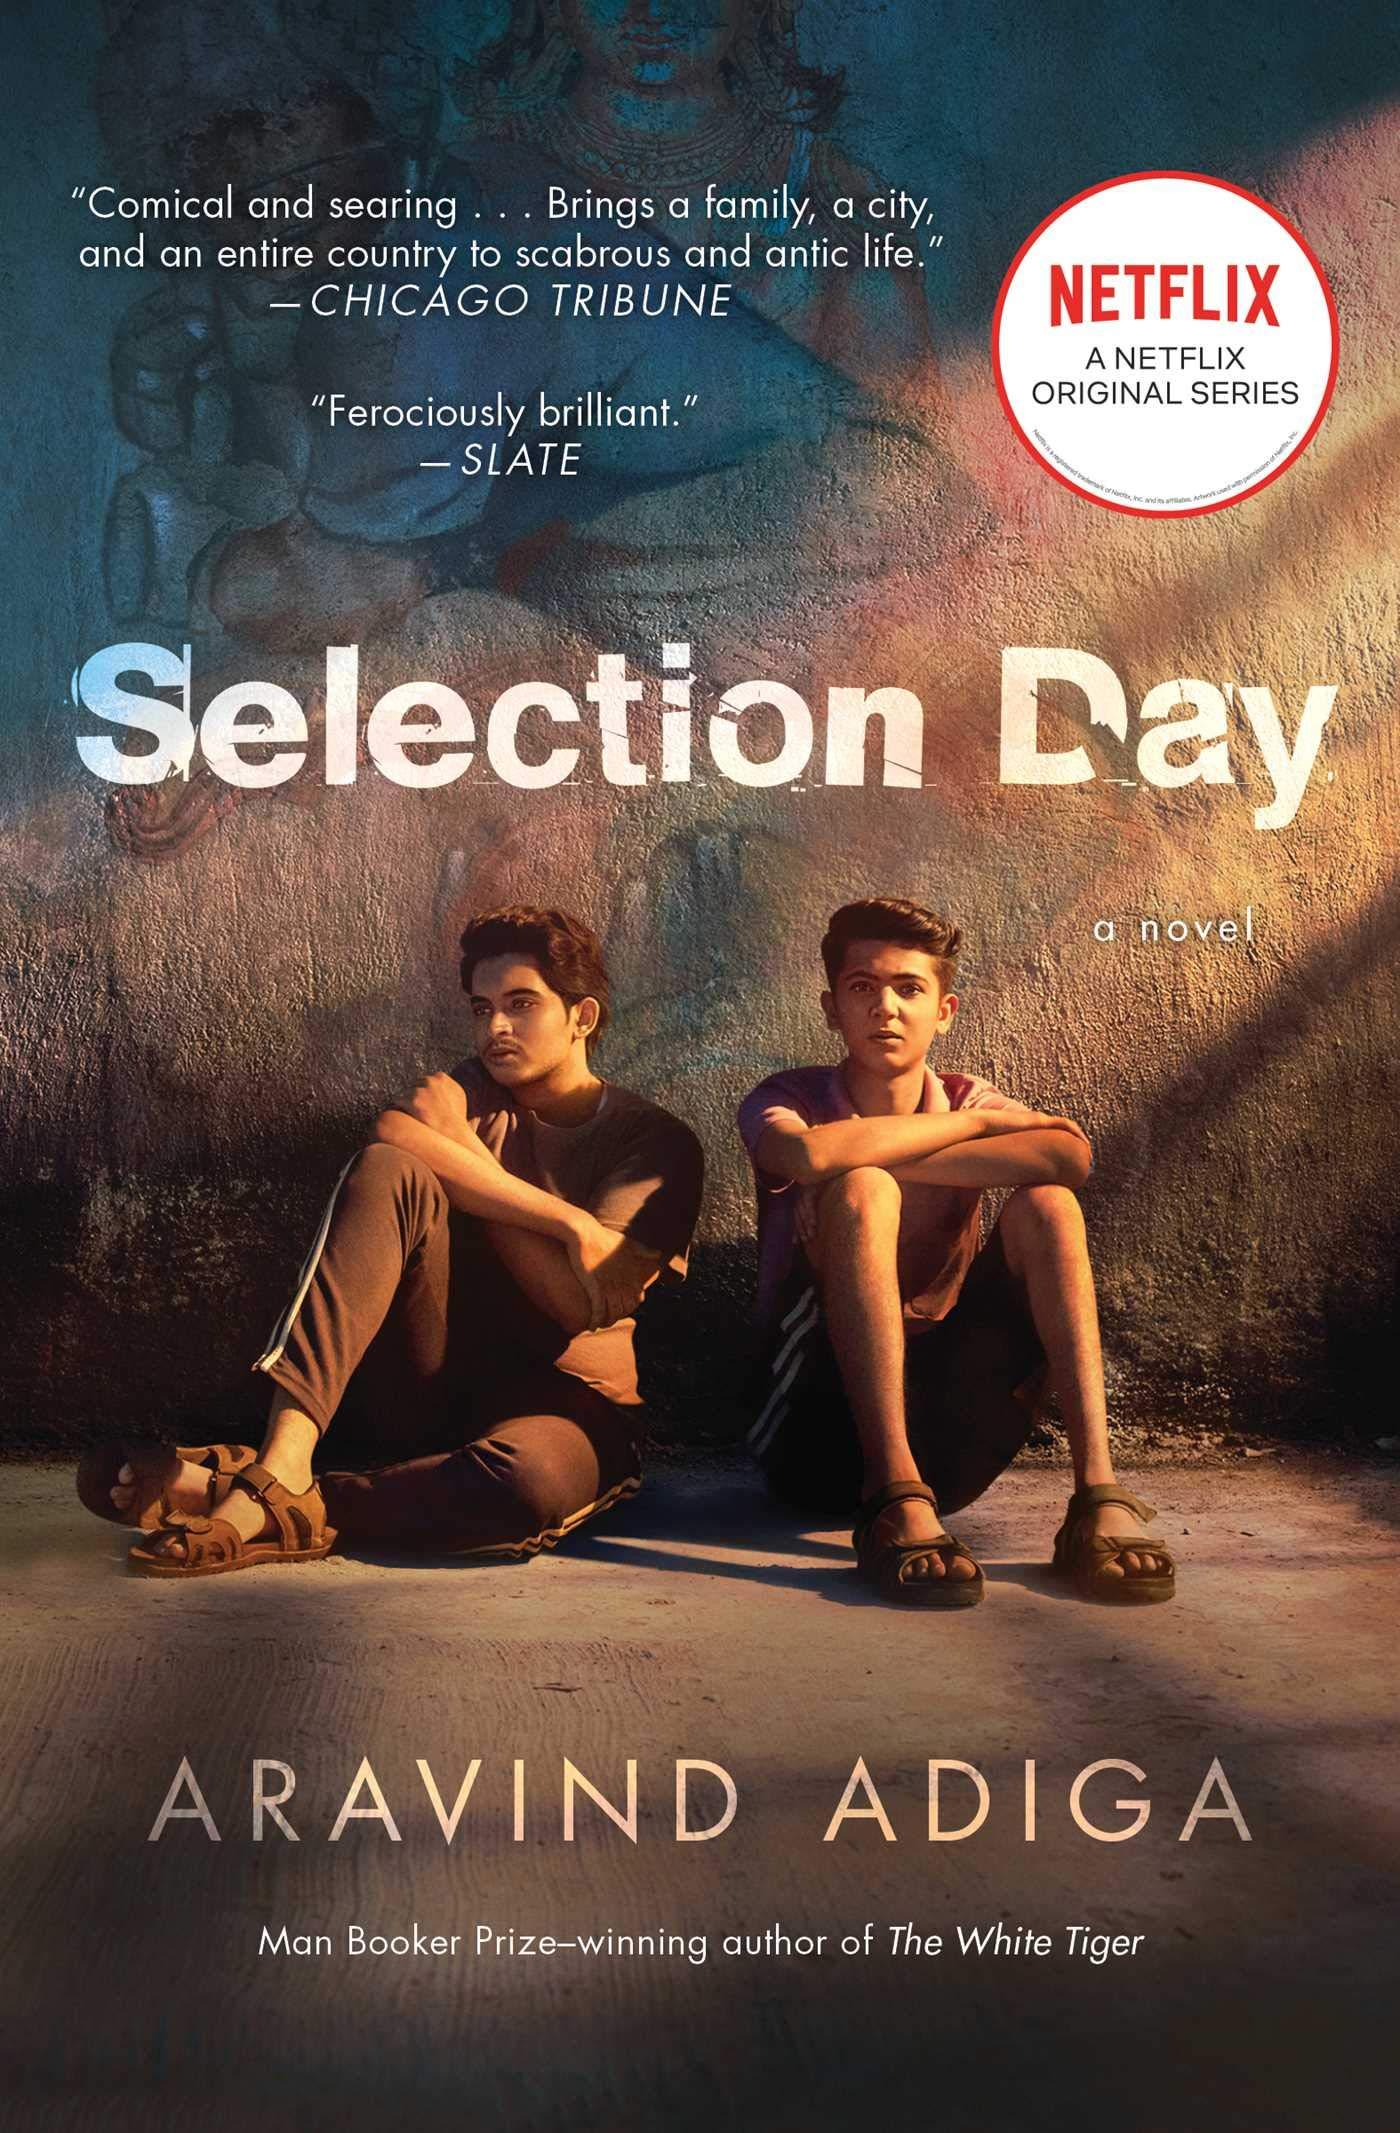 b308a48971 Amazon.com: Selection Day: A Novel (9781982117535): Aravind Adiga: Books